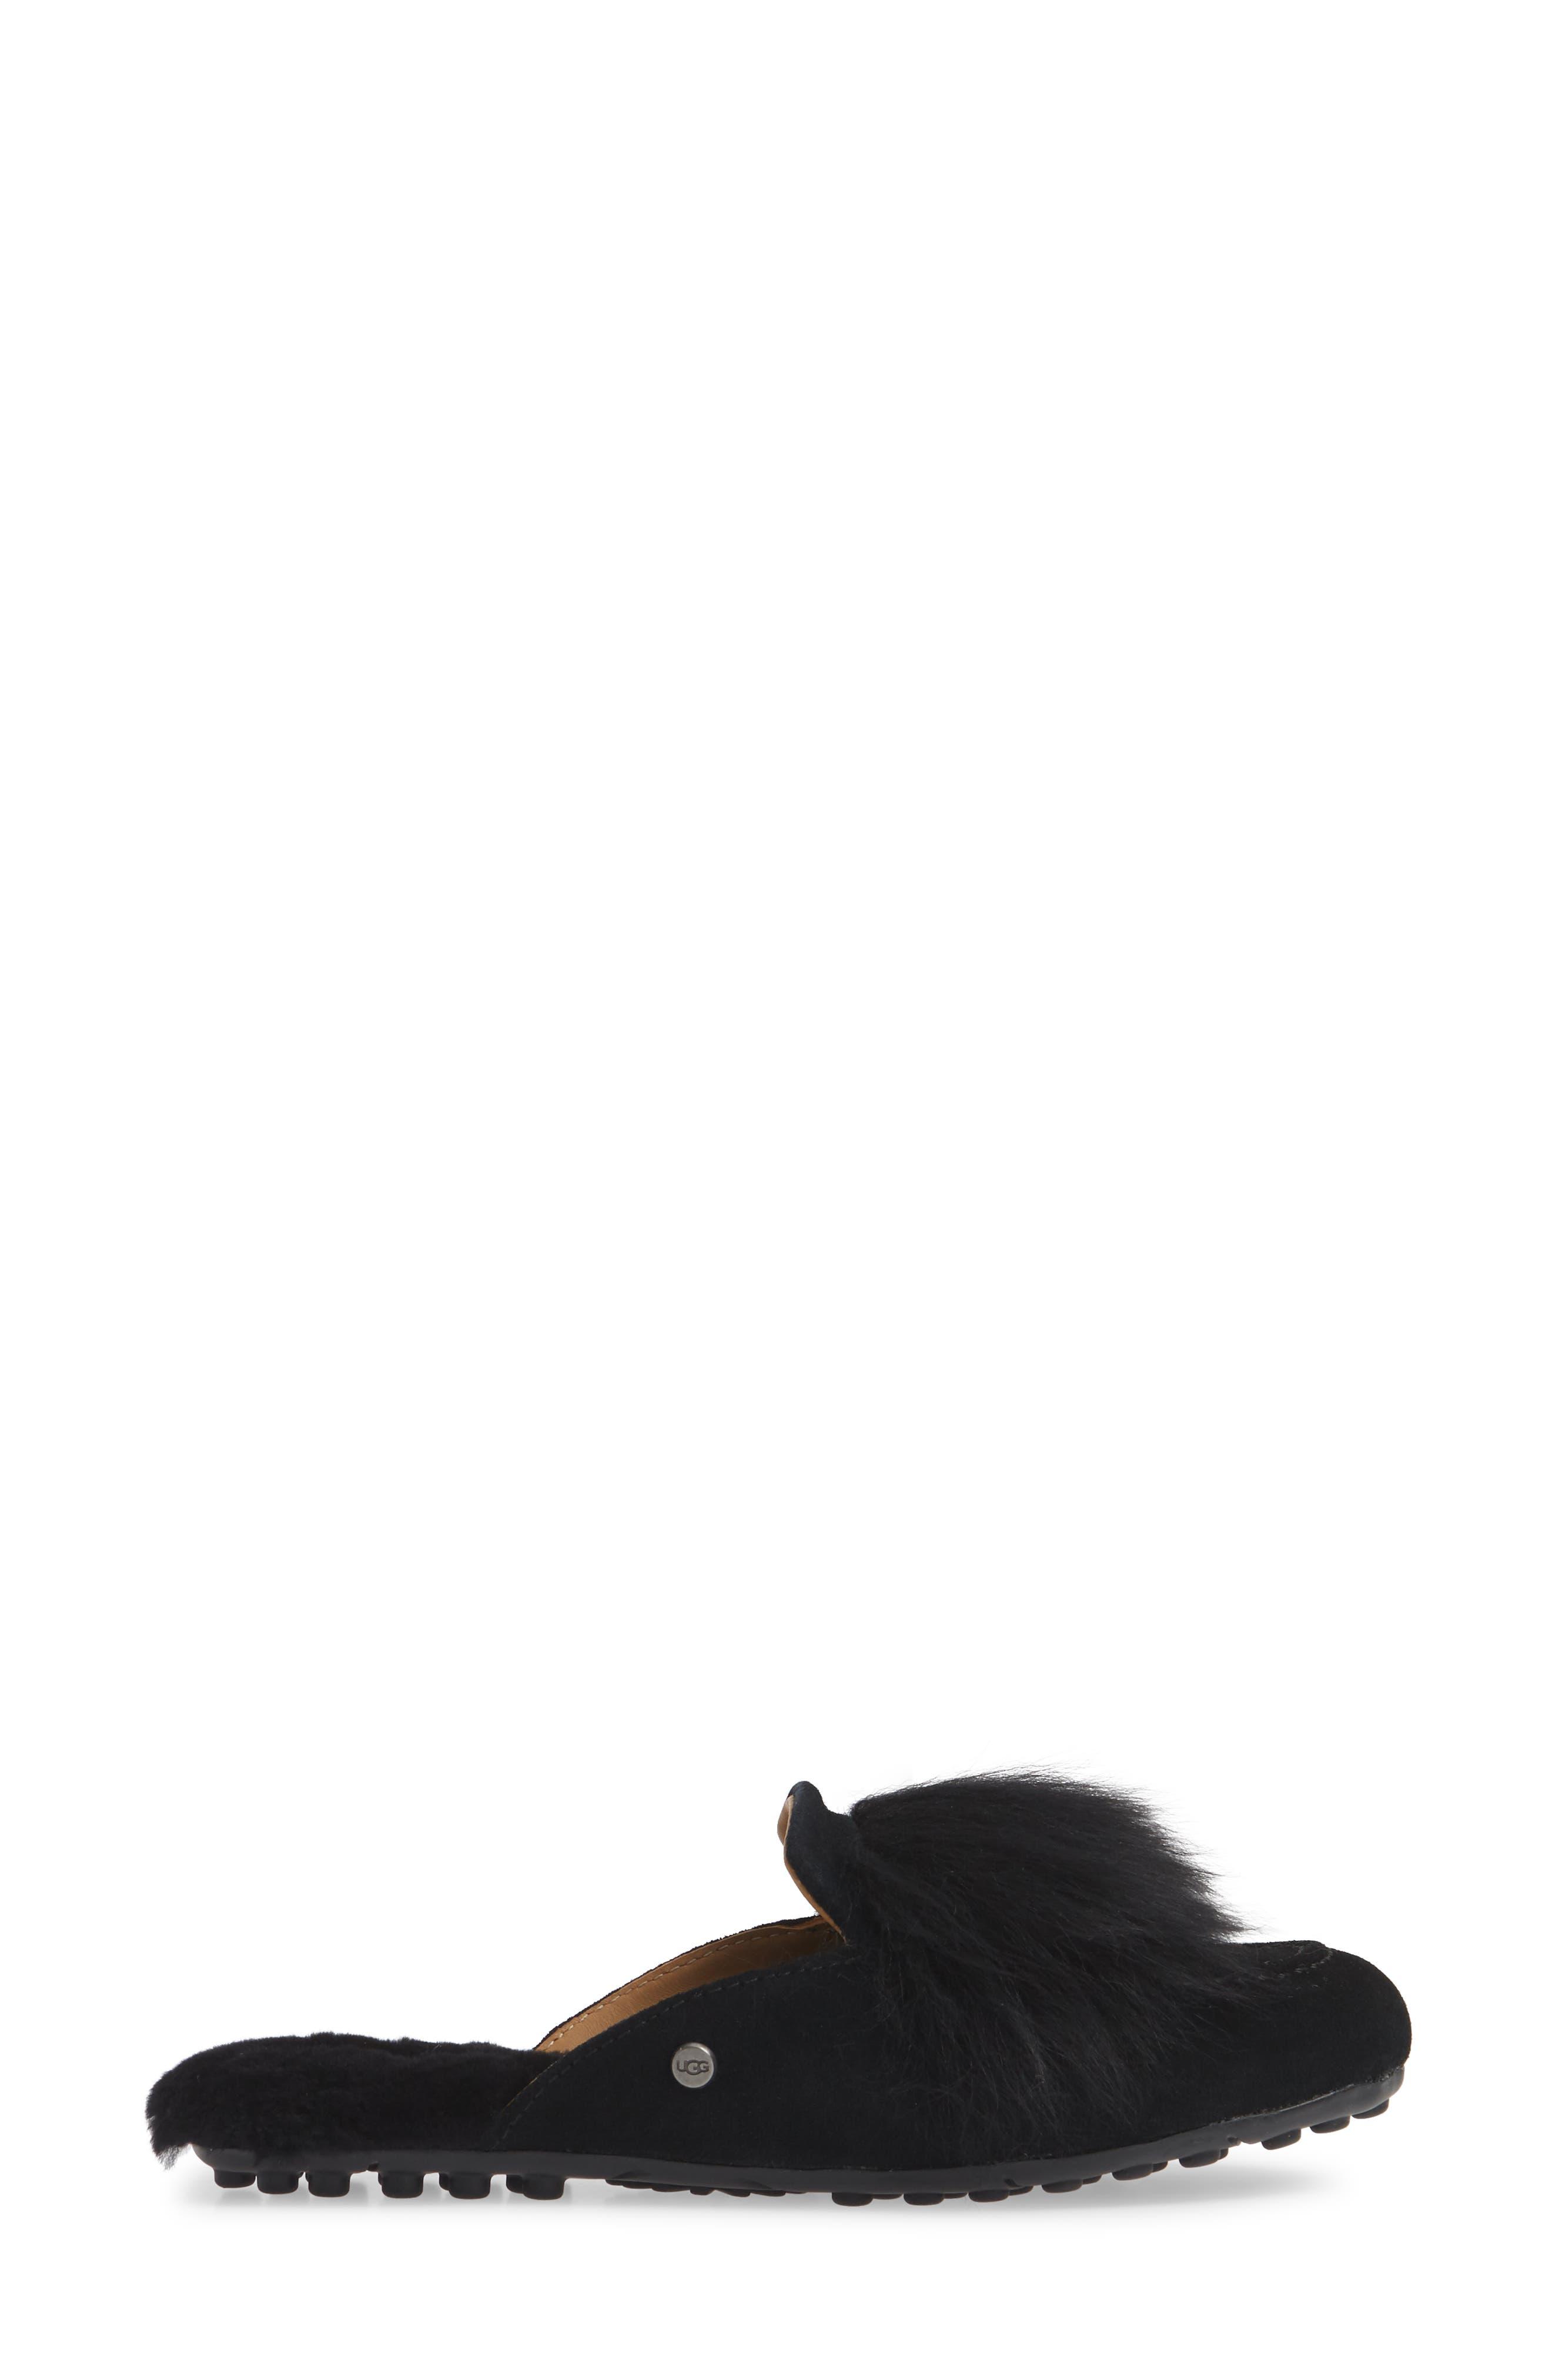 UGG<SUP>®</SUP>, Shaine Wisp Genuine Shearling Slipper, Alternate thumbnail 3, color, BLACK